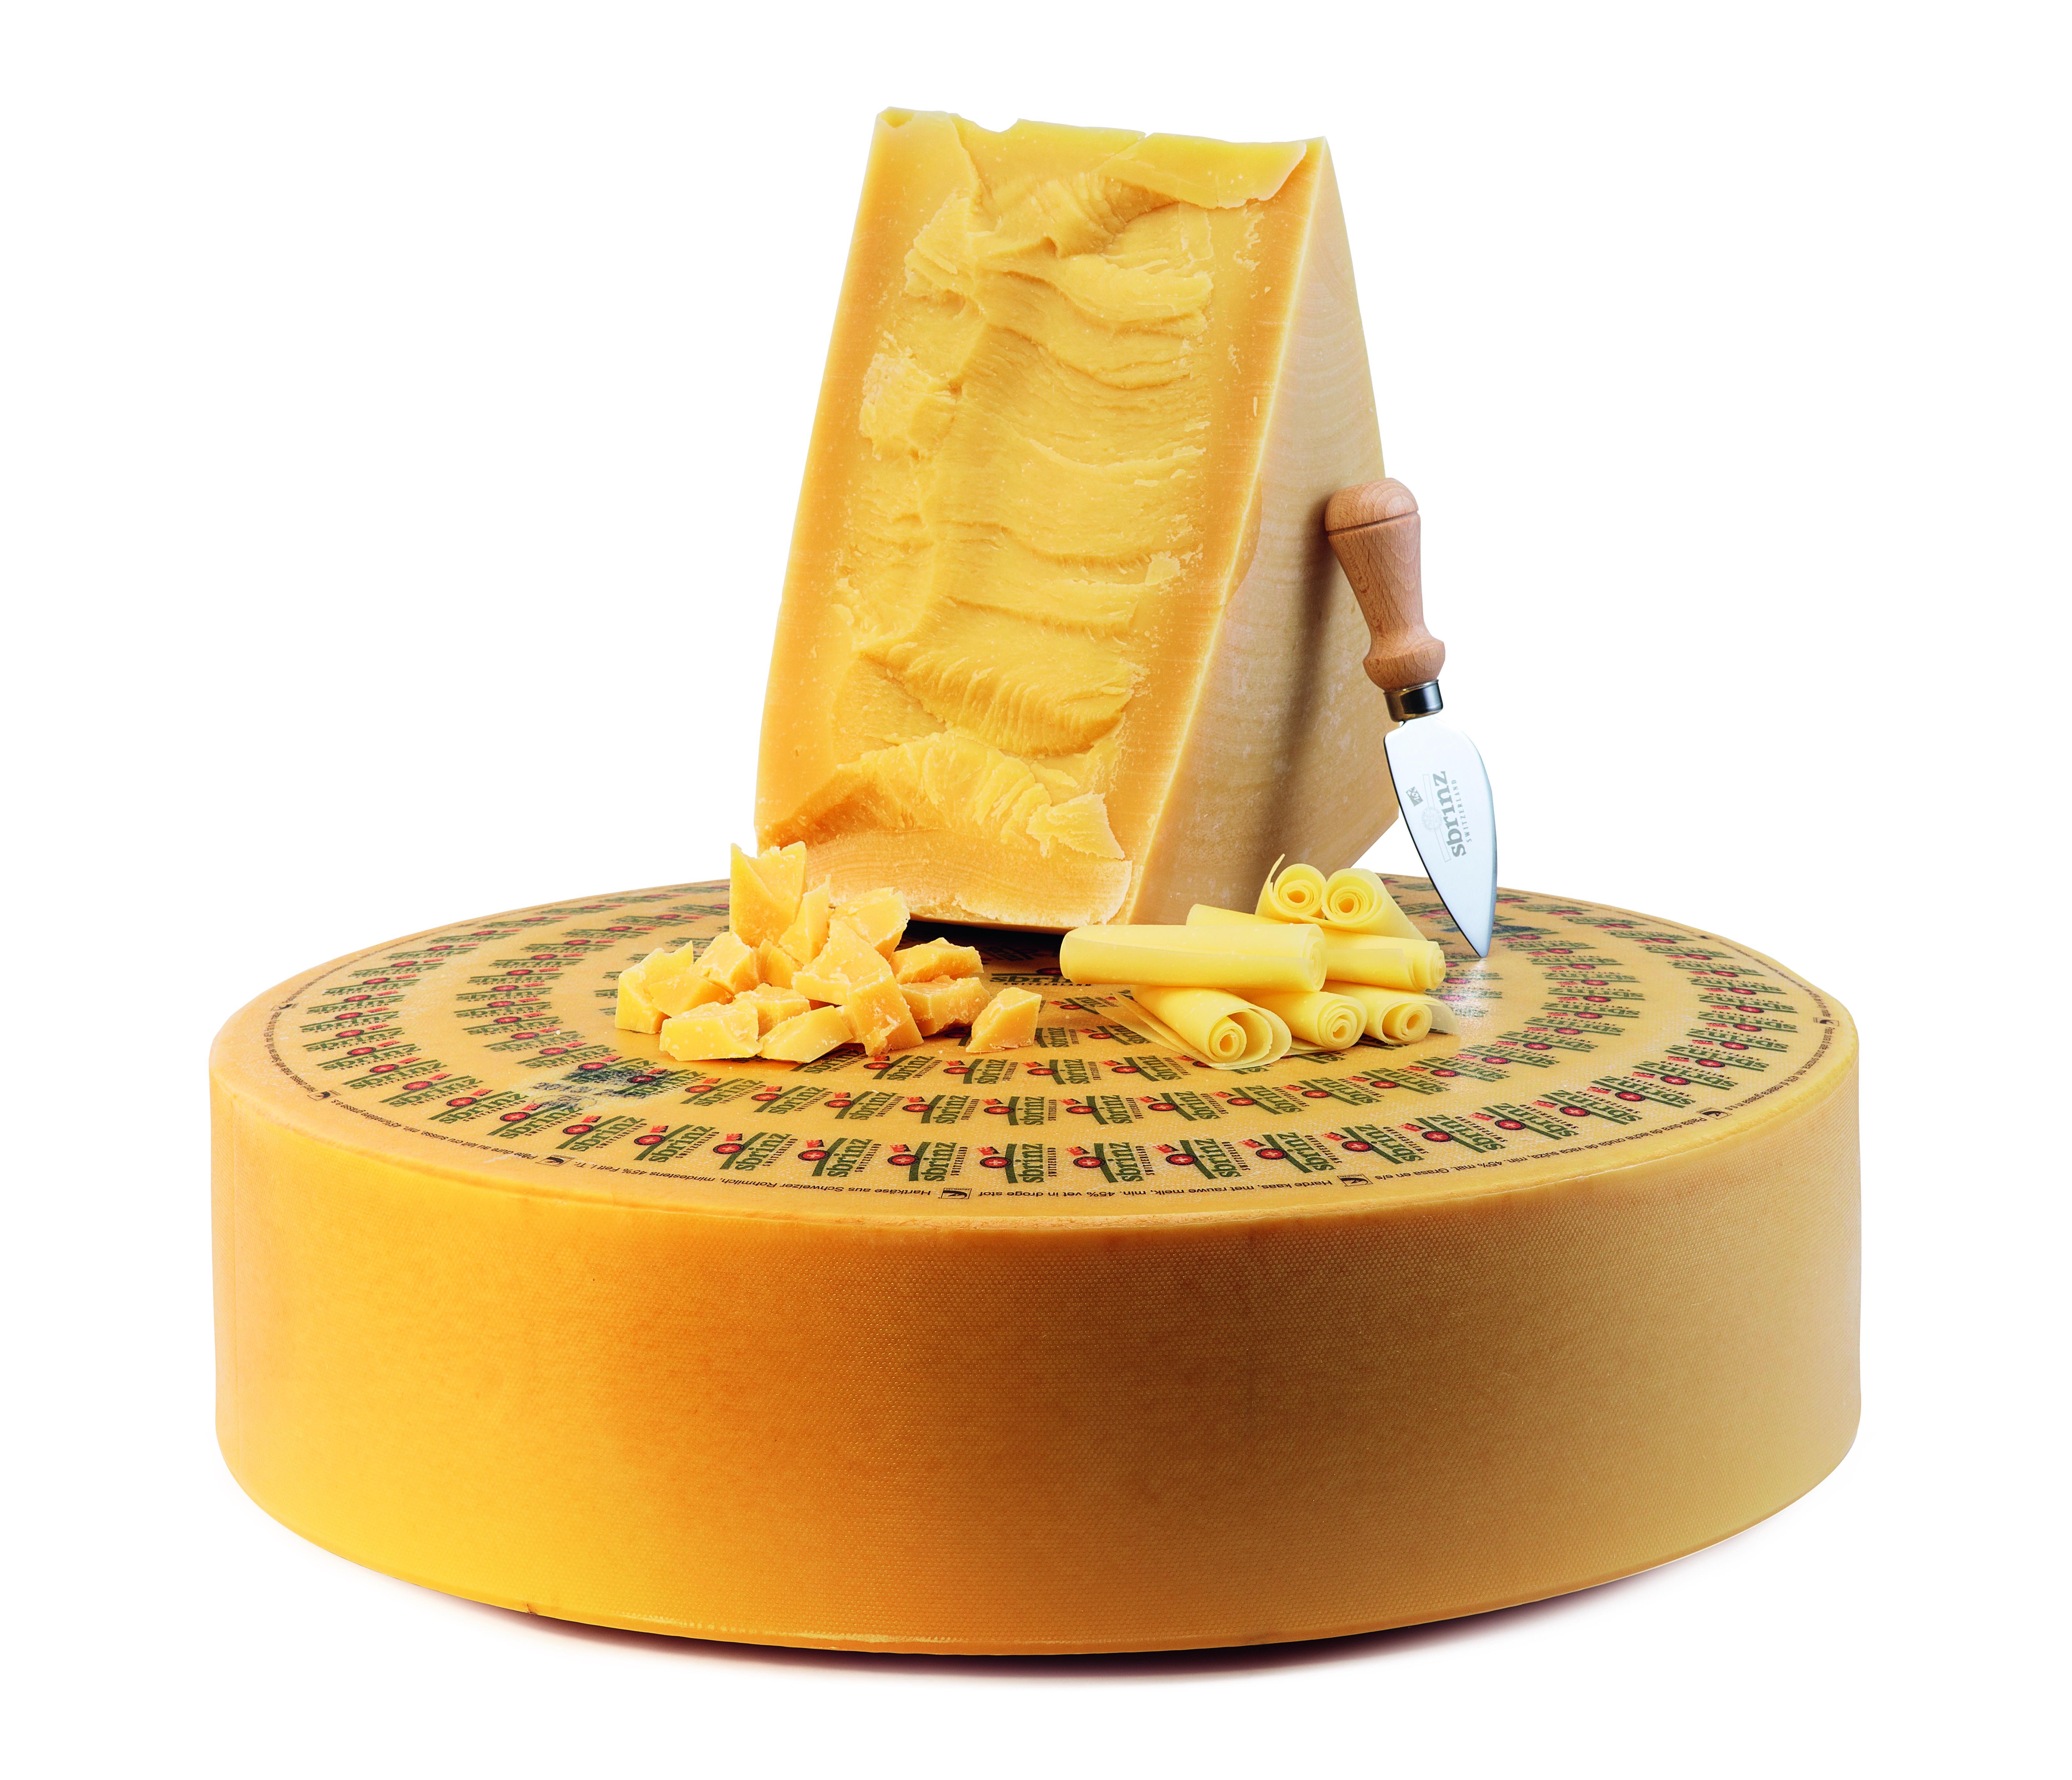 Fromages suisses - Sbrinz AOP